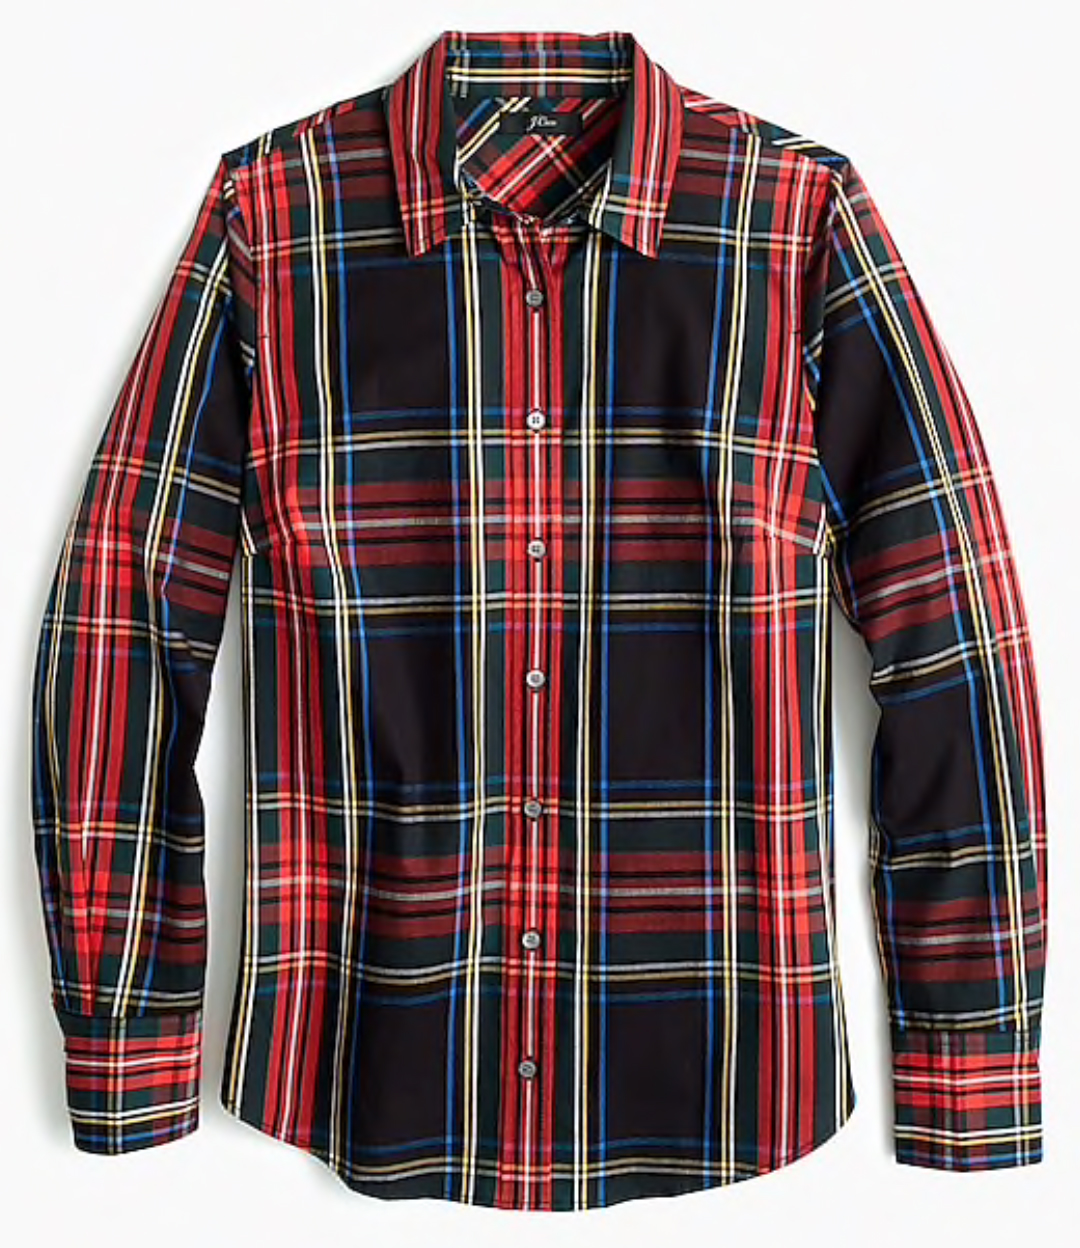 J.Crew: Stuart Tartan Perfect Shirt